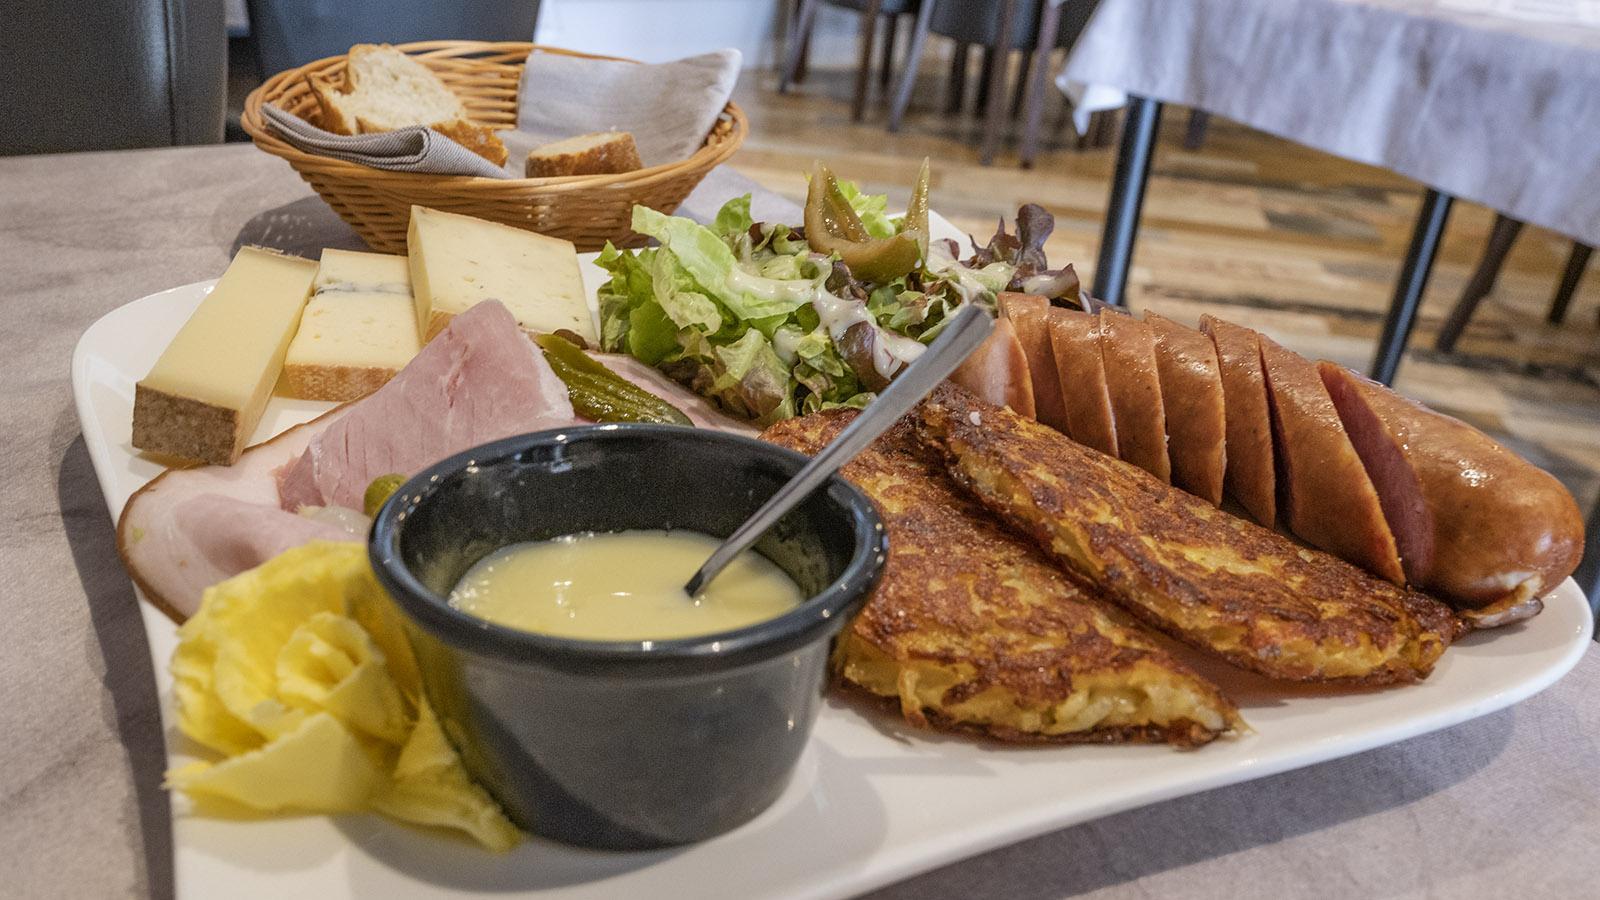 Üppig: die <em>planche comtoise</em> der Pause Gourmance. Foto: Hilke Maunder